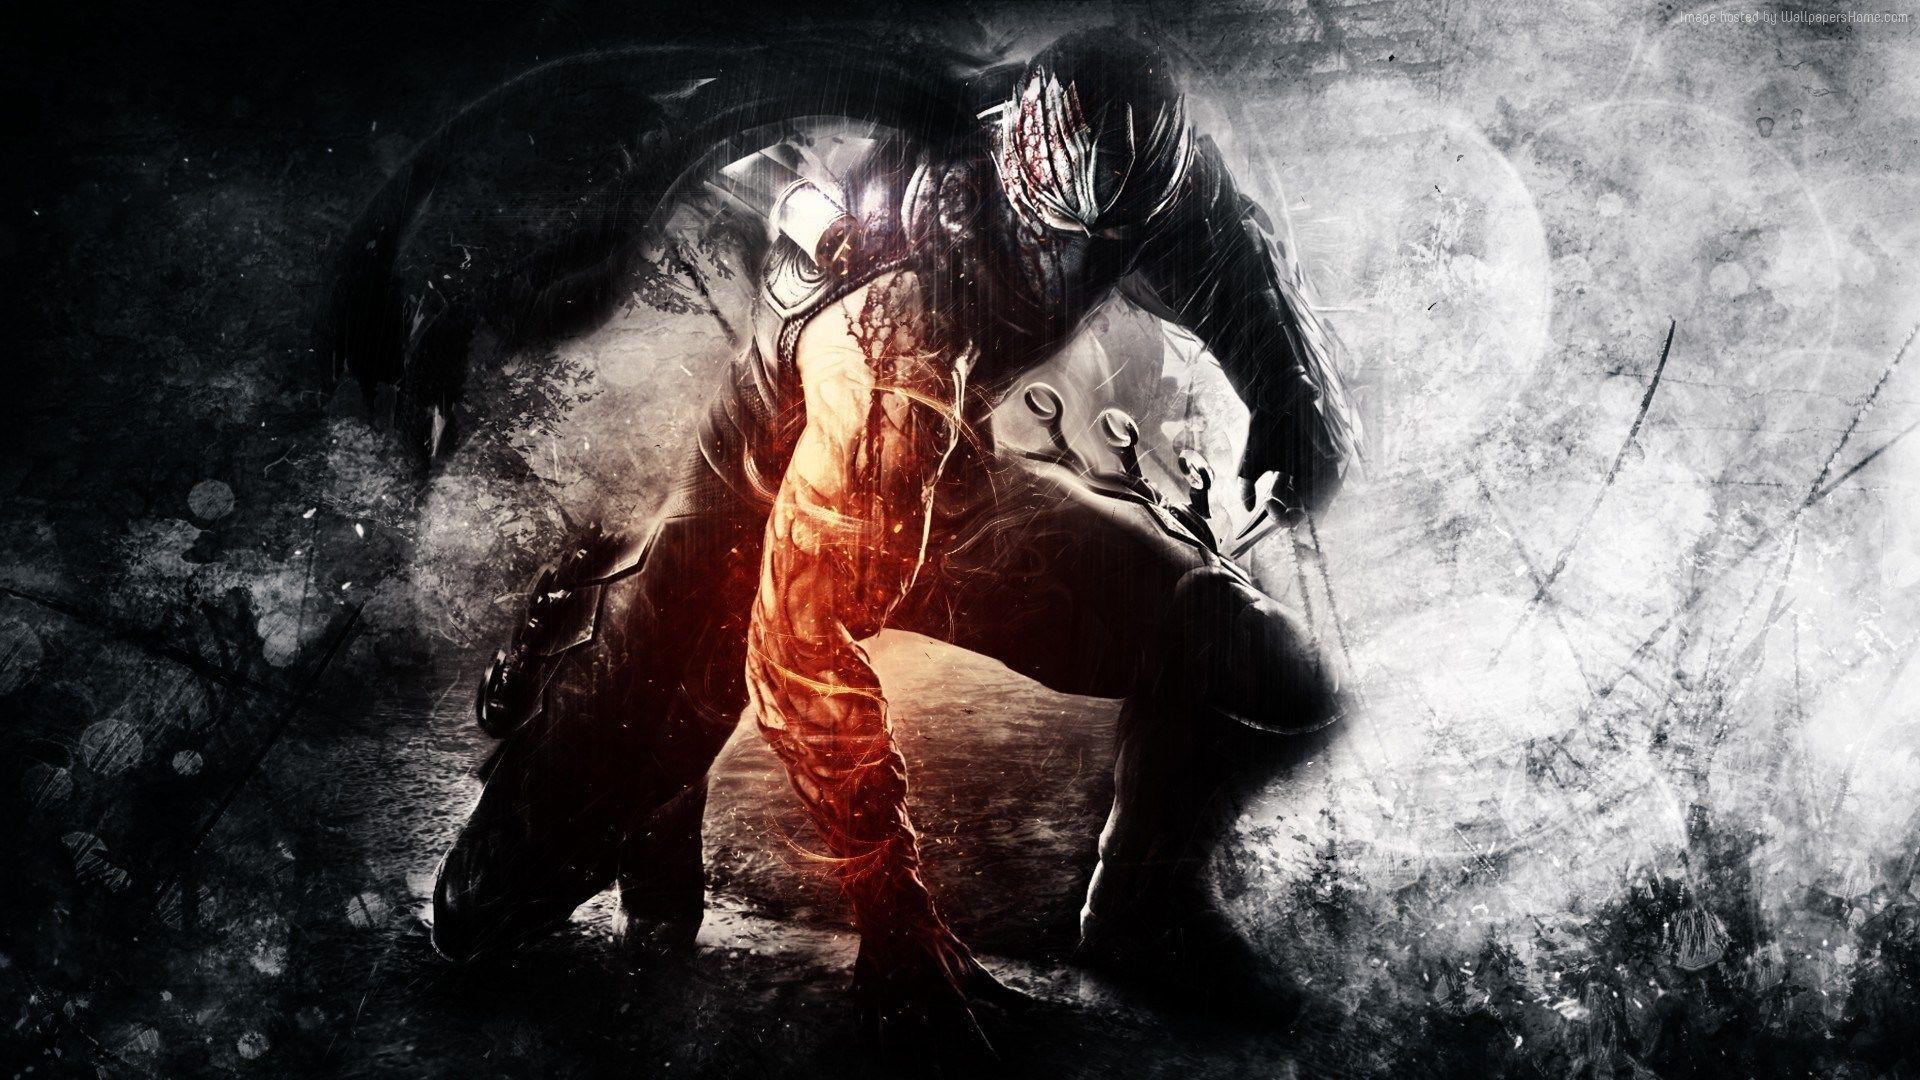 Ninja Gaiden 3 Wallpaper Games Uhd Full Hd Downloads Wallpapers